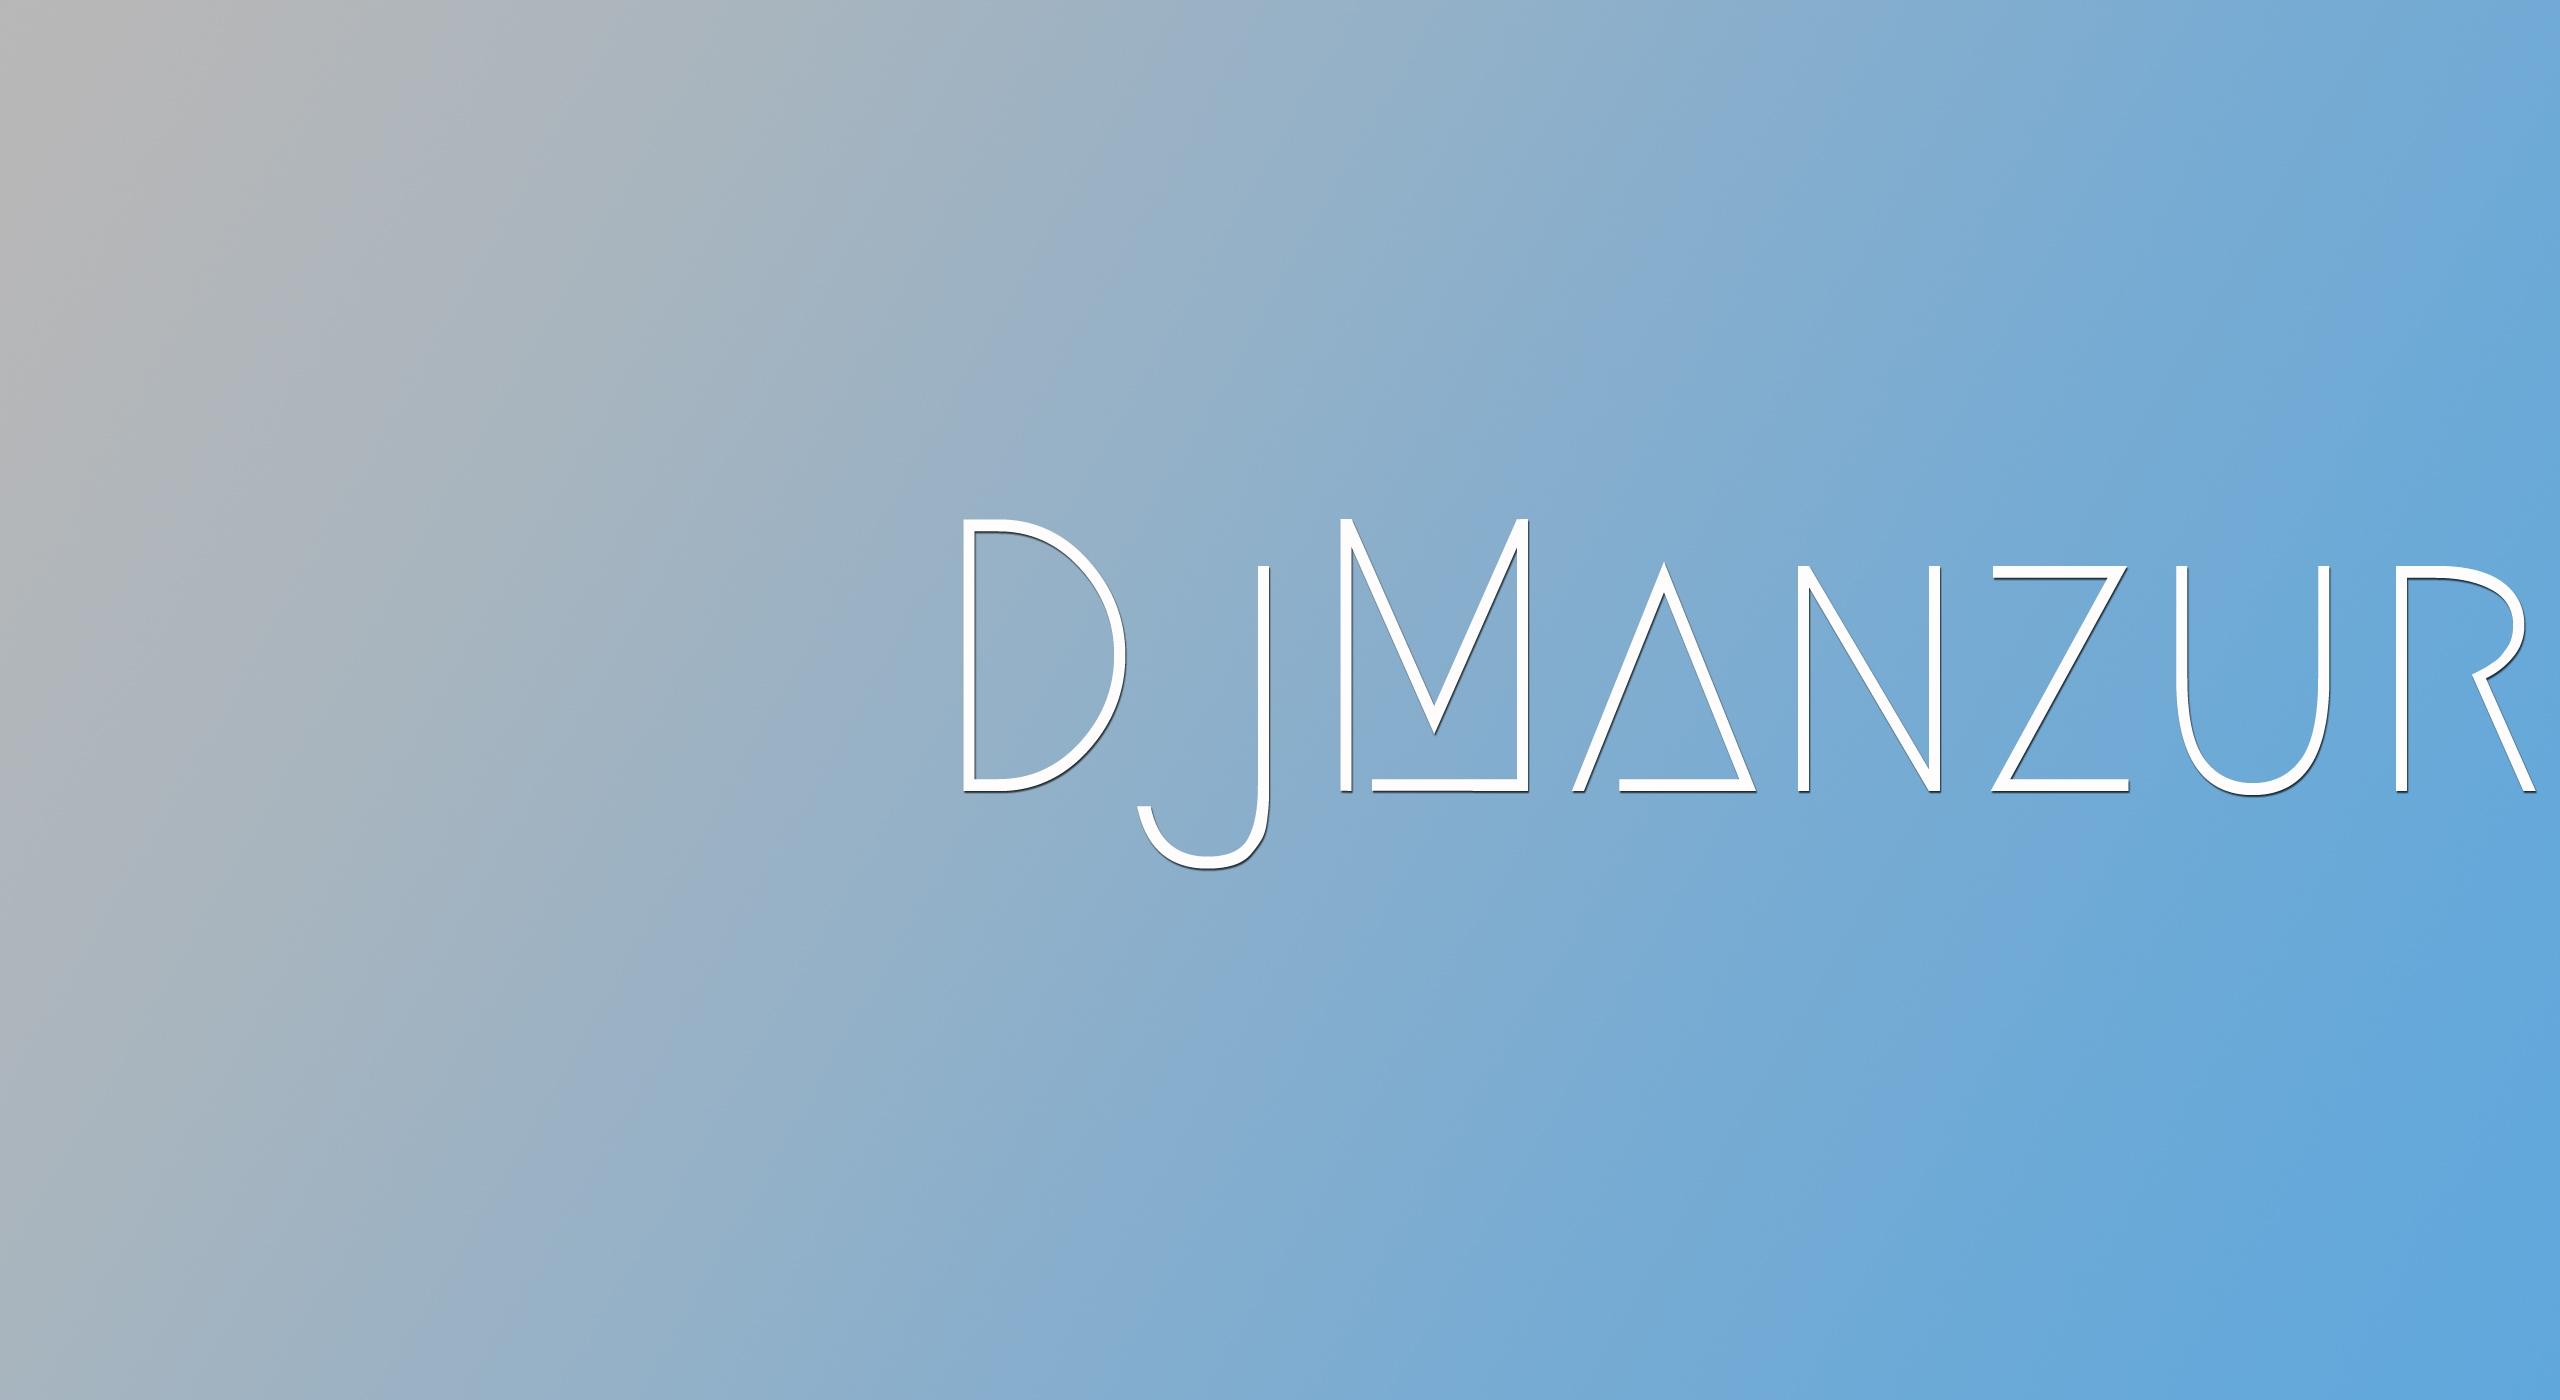 Jorge Manzur (@djmanzur) Cover Image